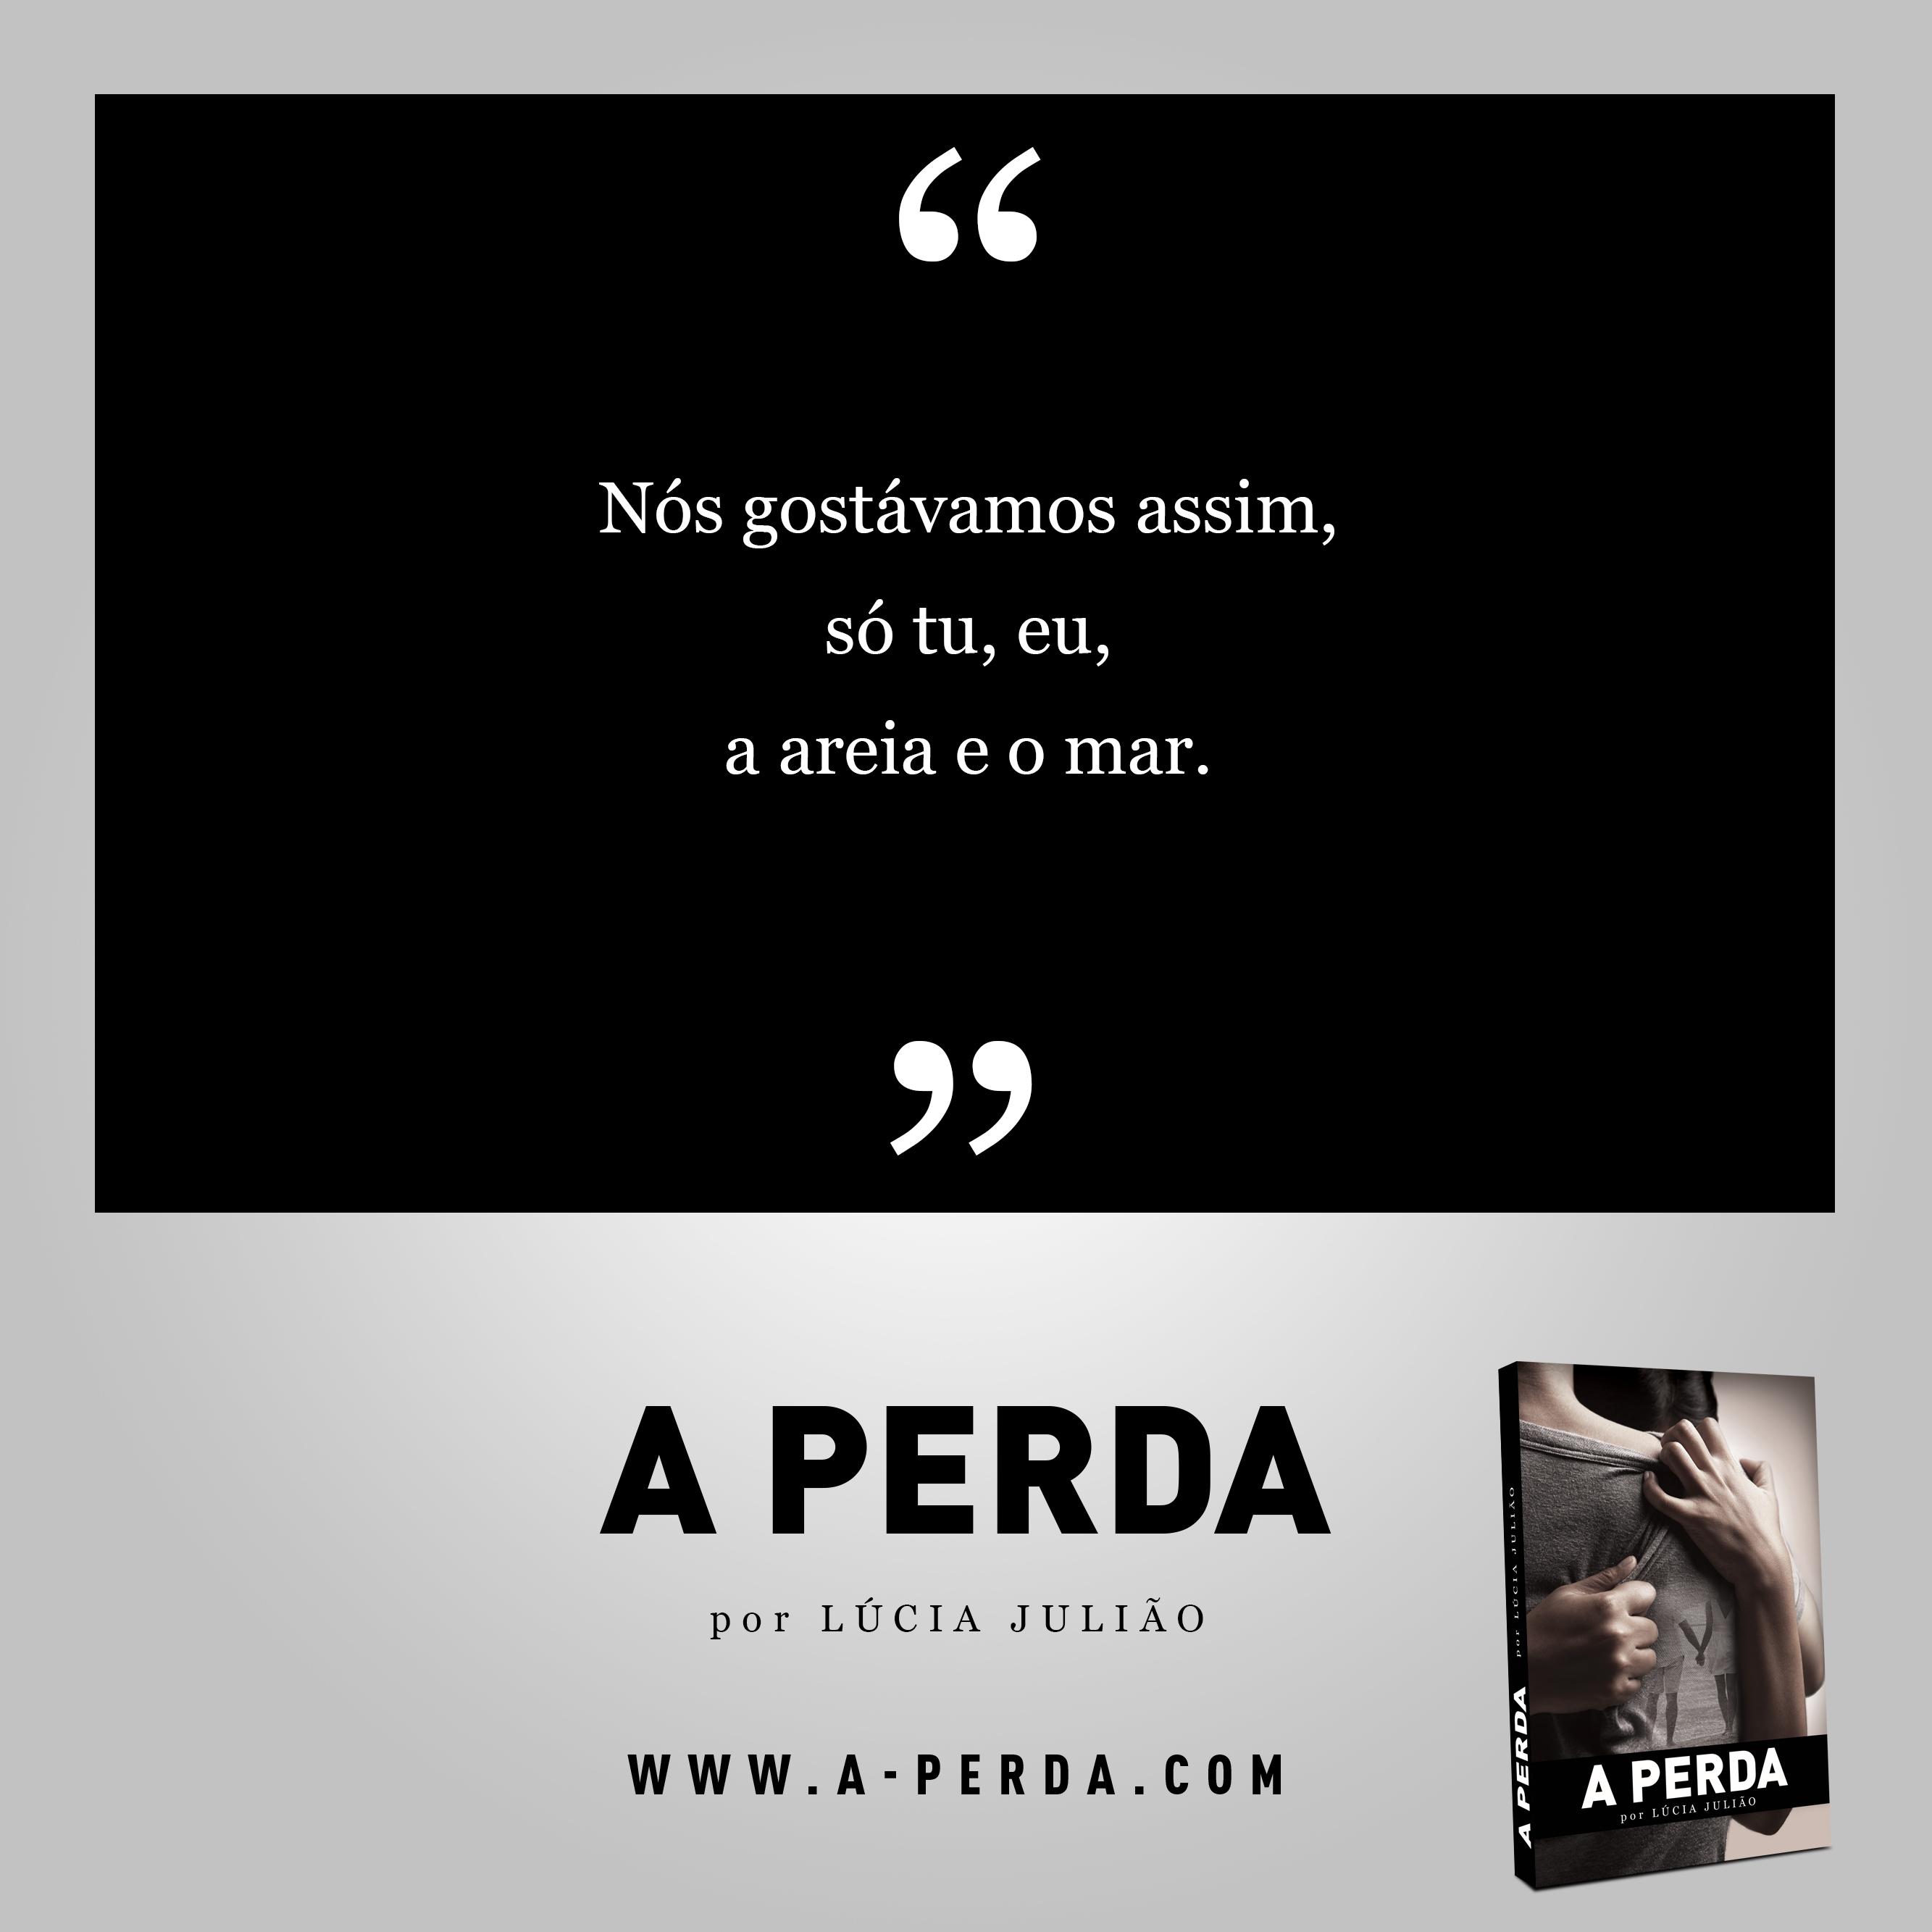 041-capitulo-27-livro-a-Perda-de-Lucia-Juliao-Instagram